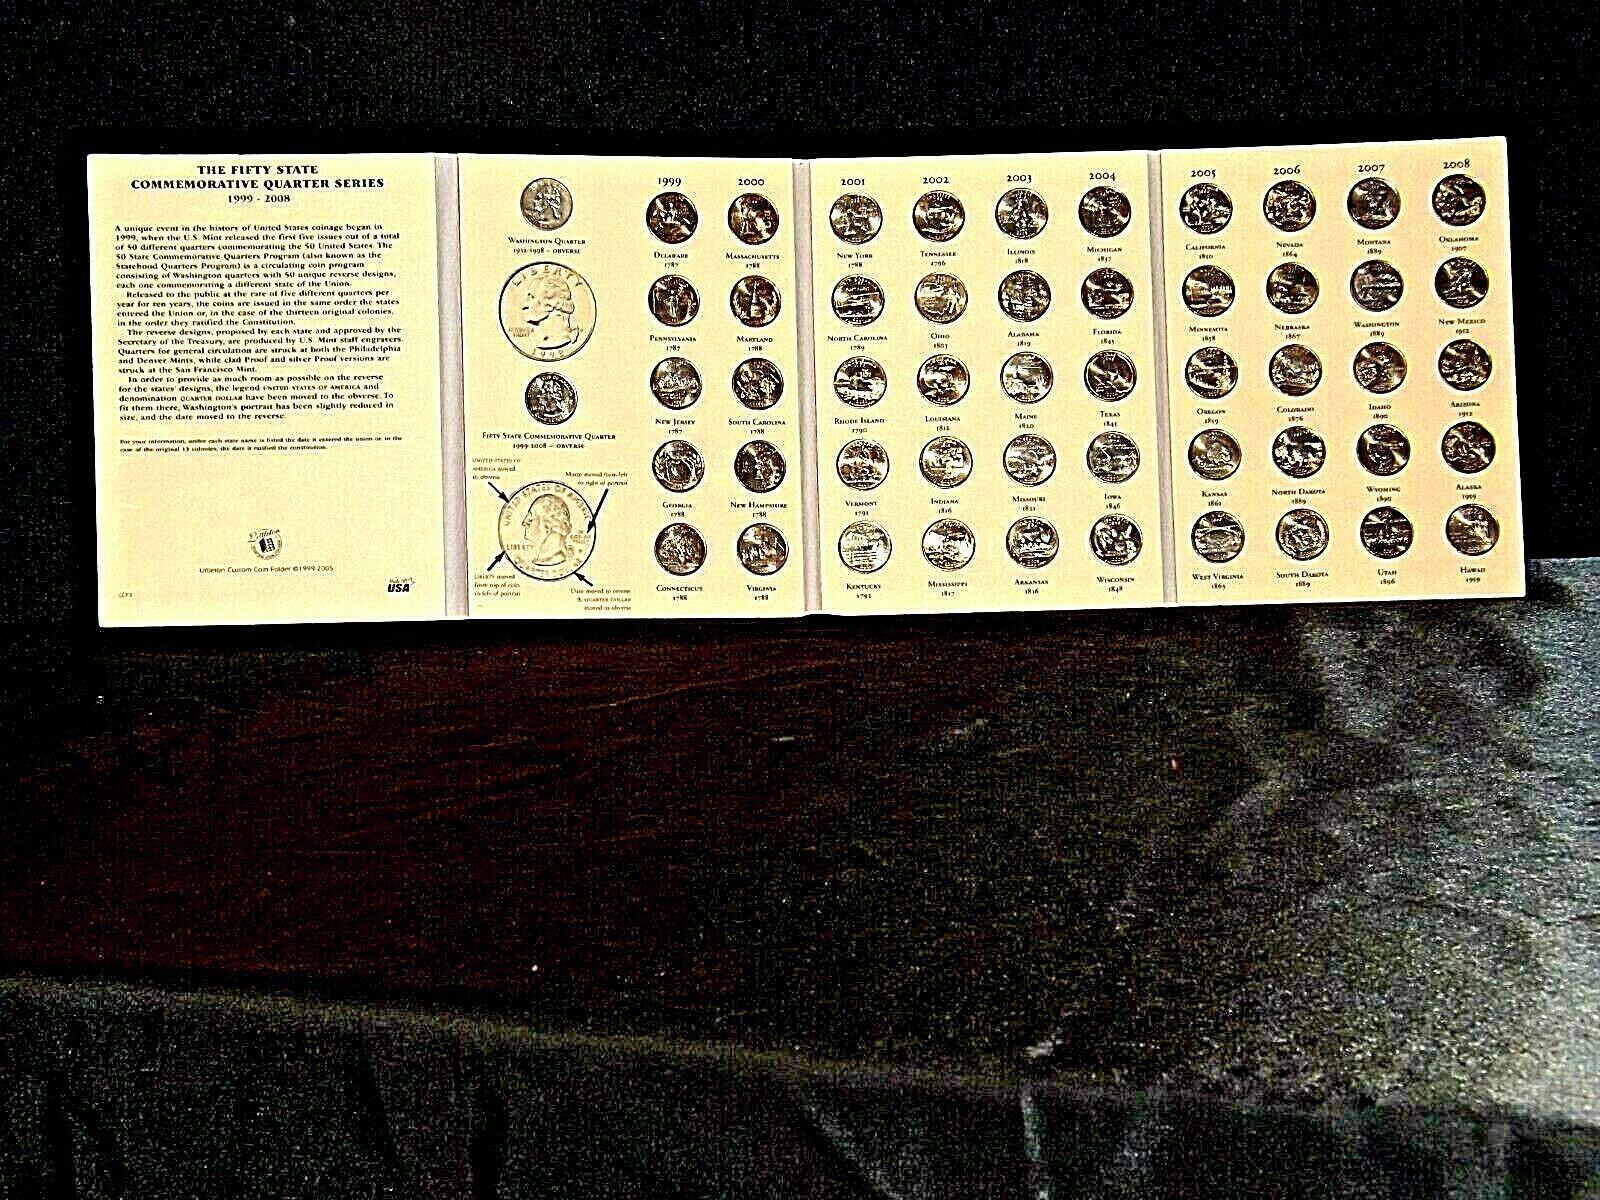 Hard Cover The 50 States Commemorative Quarters Series 1999-2008 AA19-CNQ6023